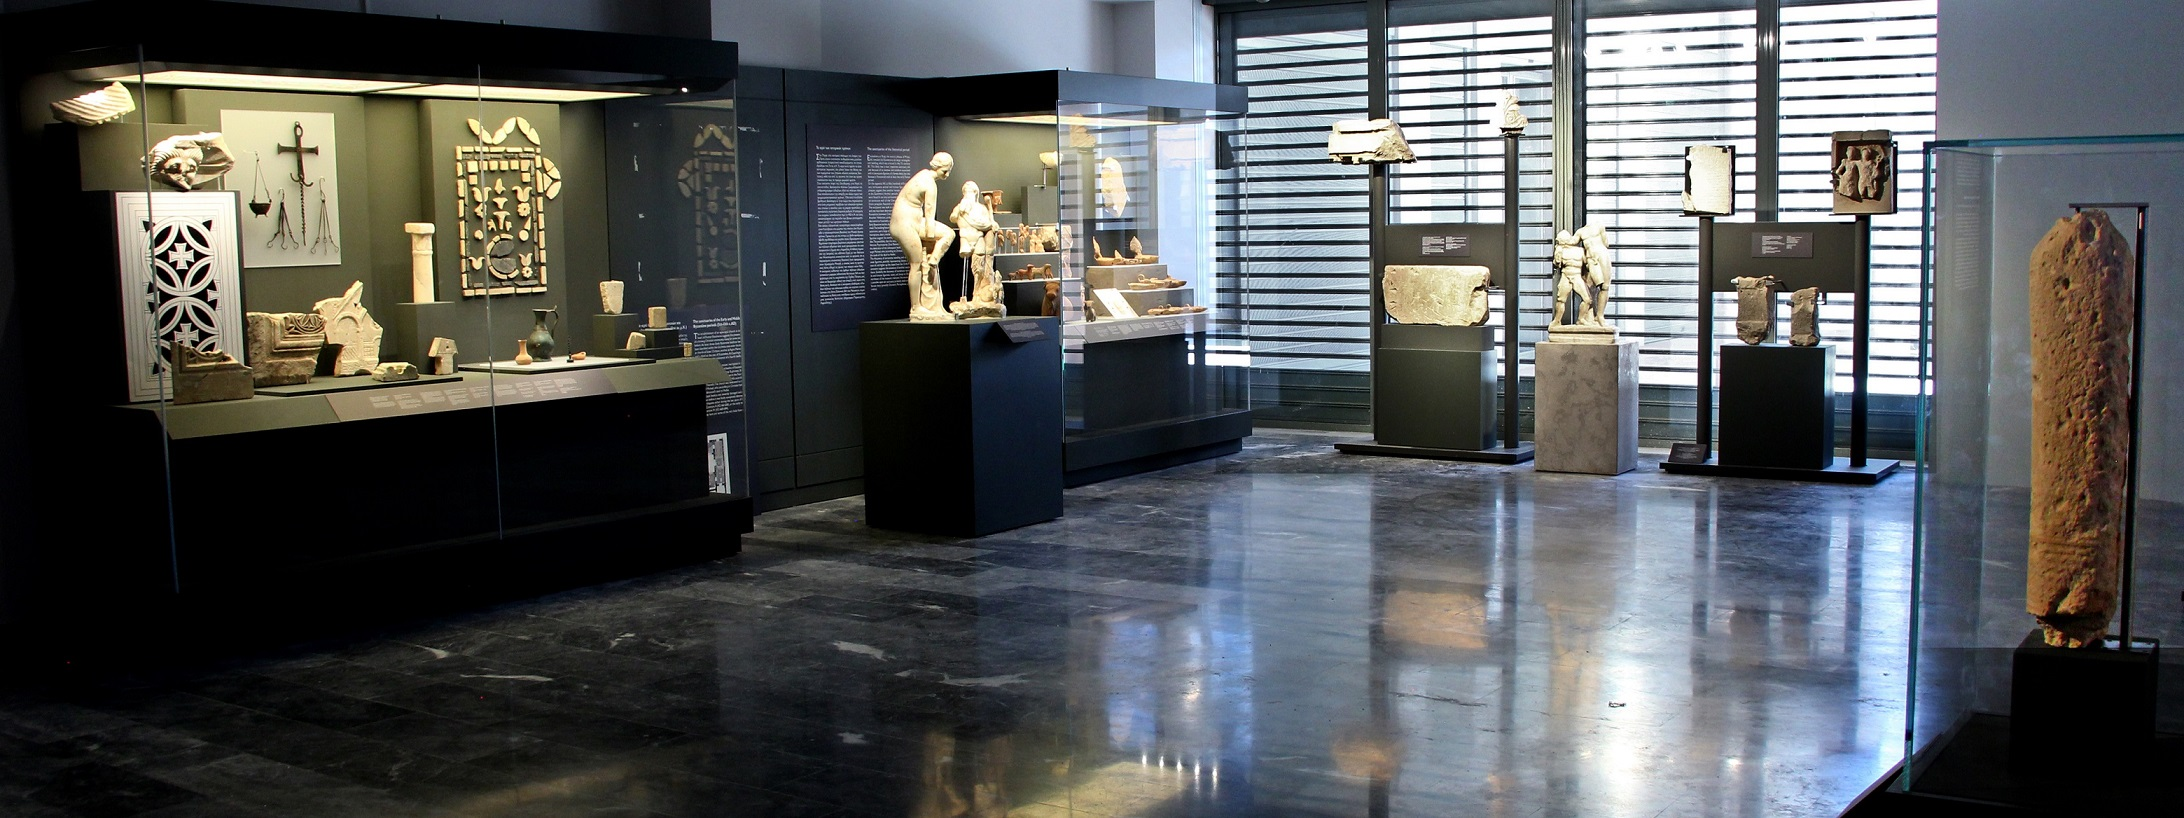 to-moyseio-archaias-eleythernas-svinei-kerakia1